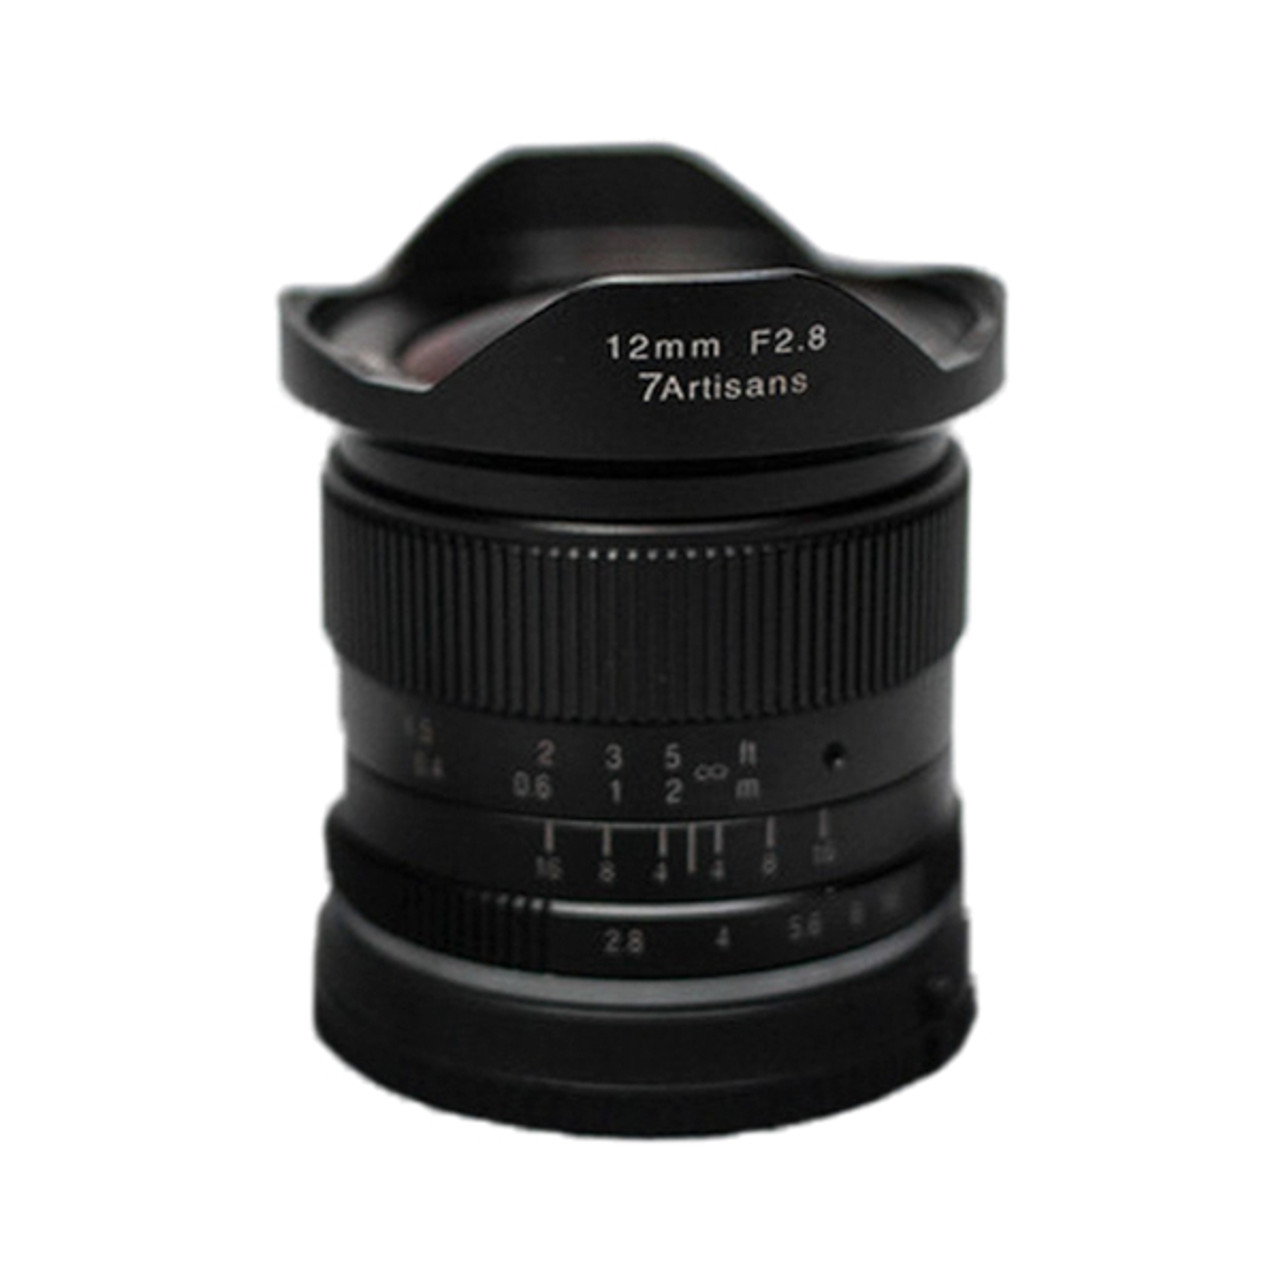 7Artisans 12mm F2.8 (Fujifilm) (X Mount)